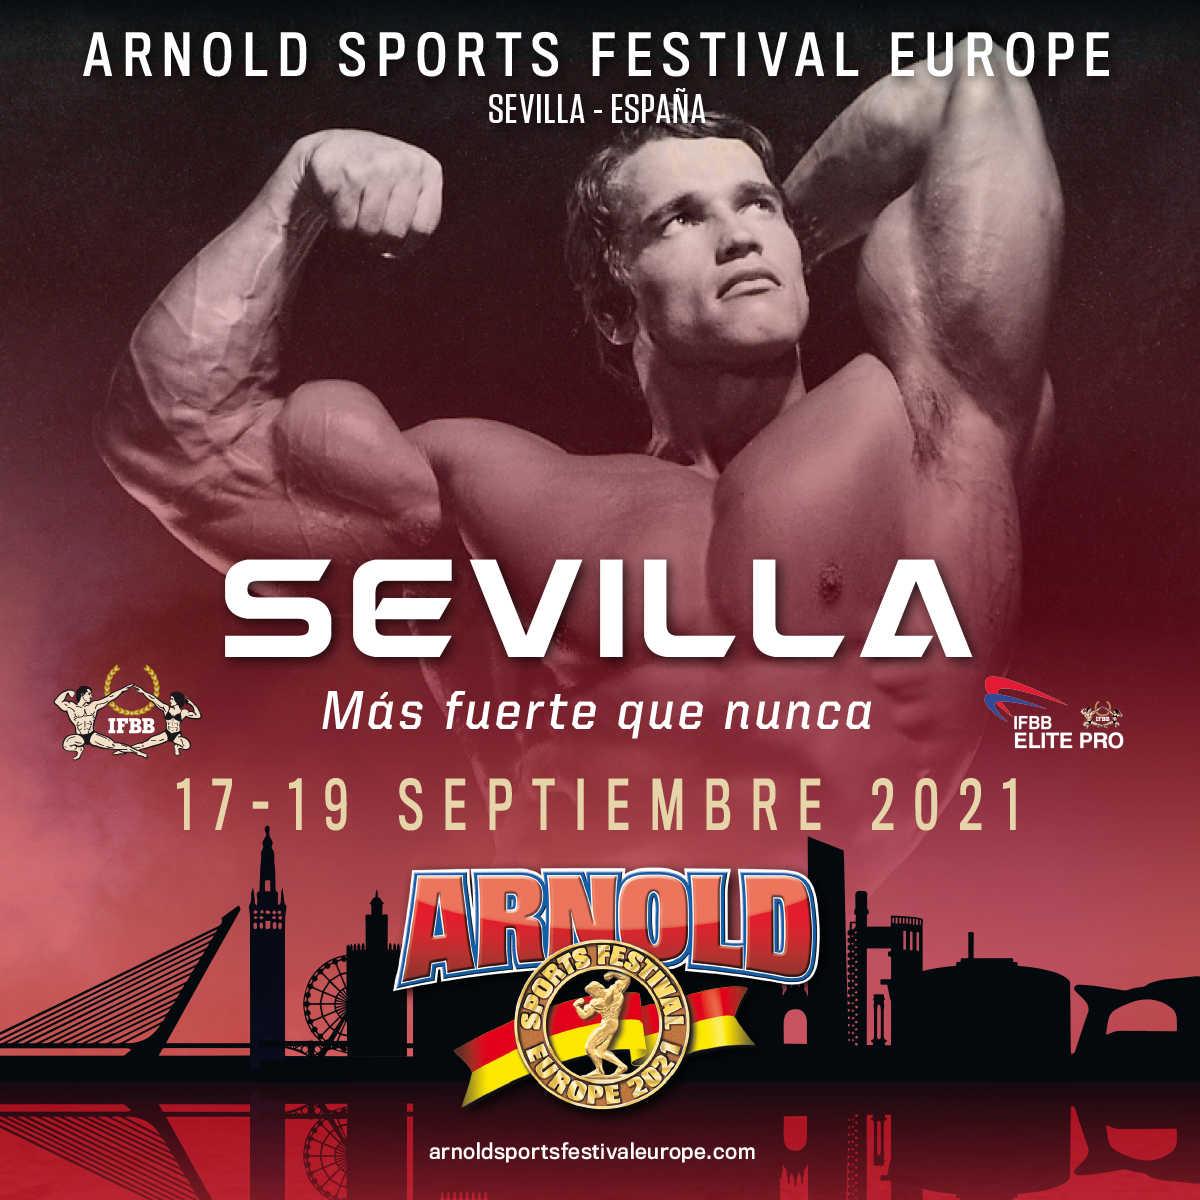 Arnold Sports Festival Europe